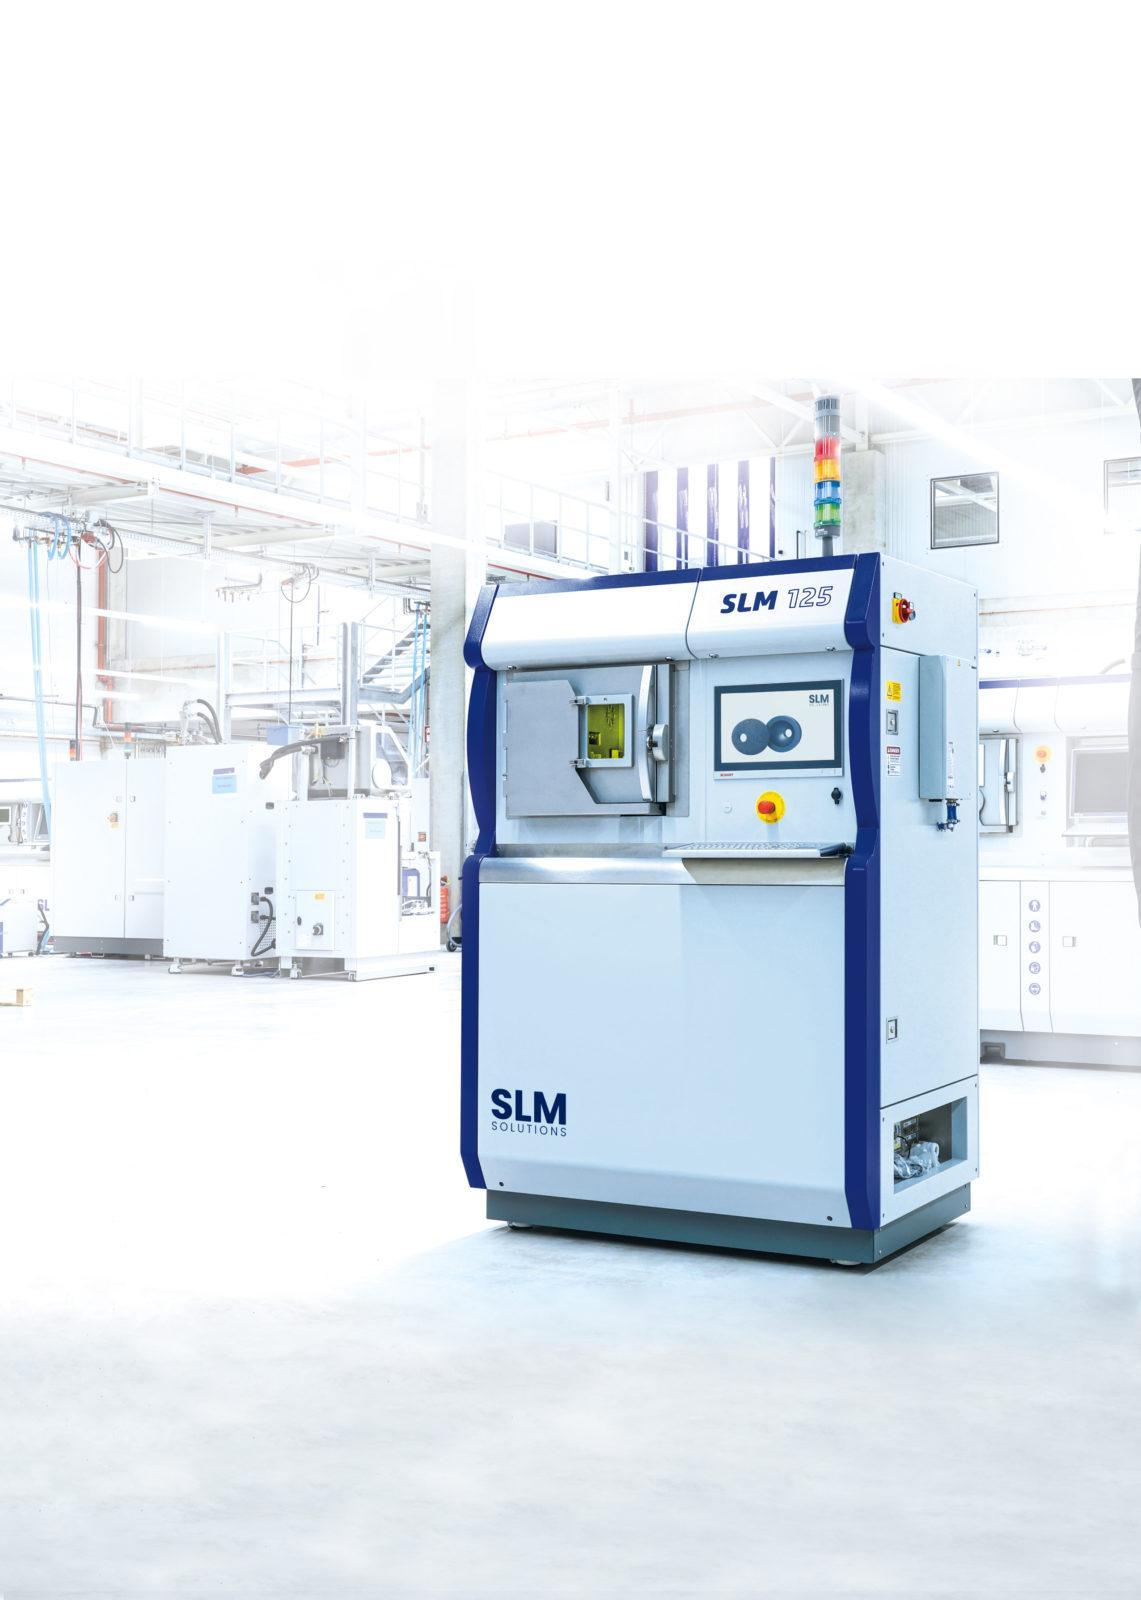 SLM 125 machine